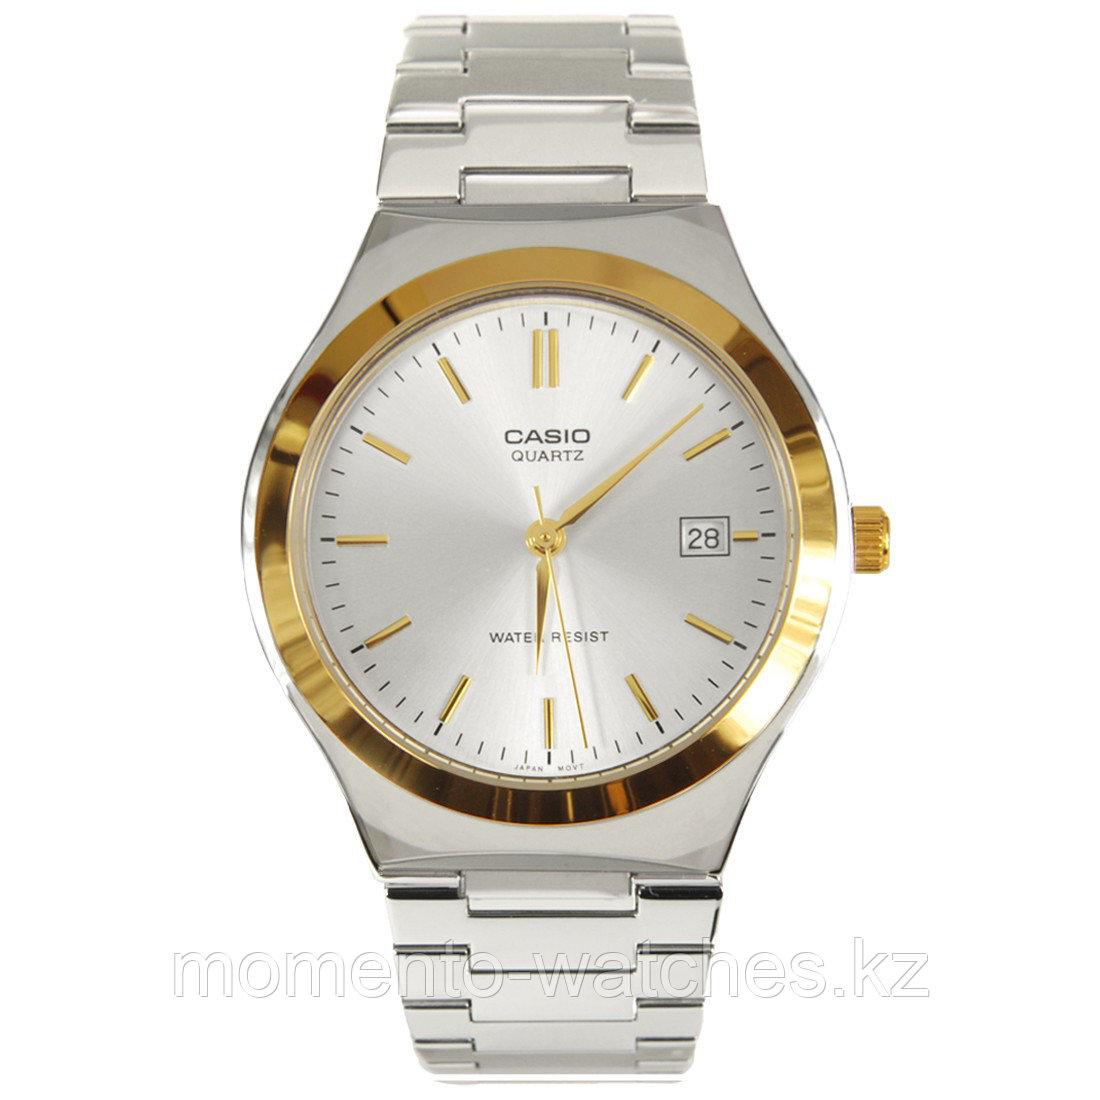 Мужские часы Casio MTP-1170G-7ARDF